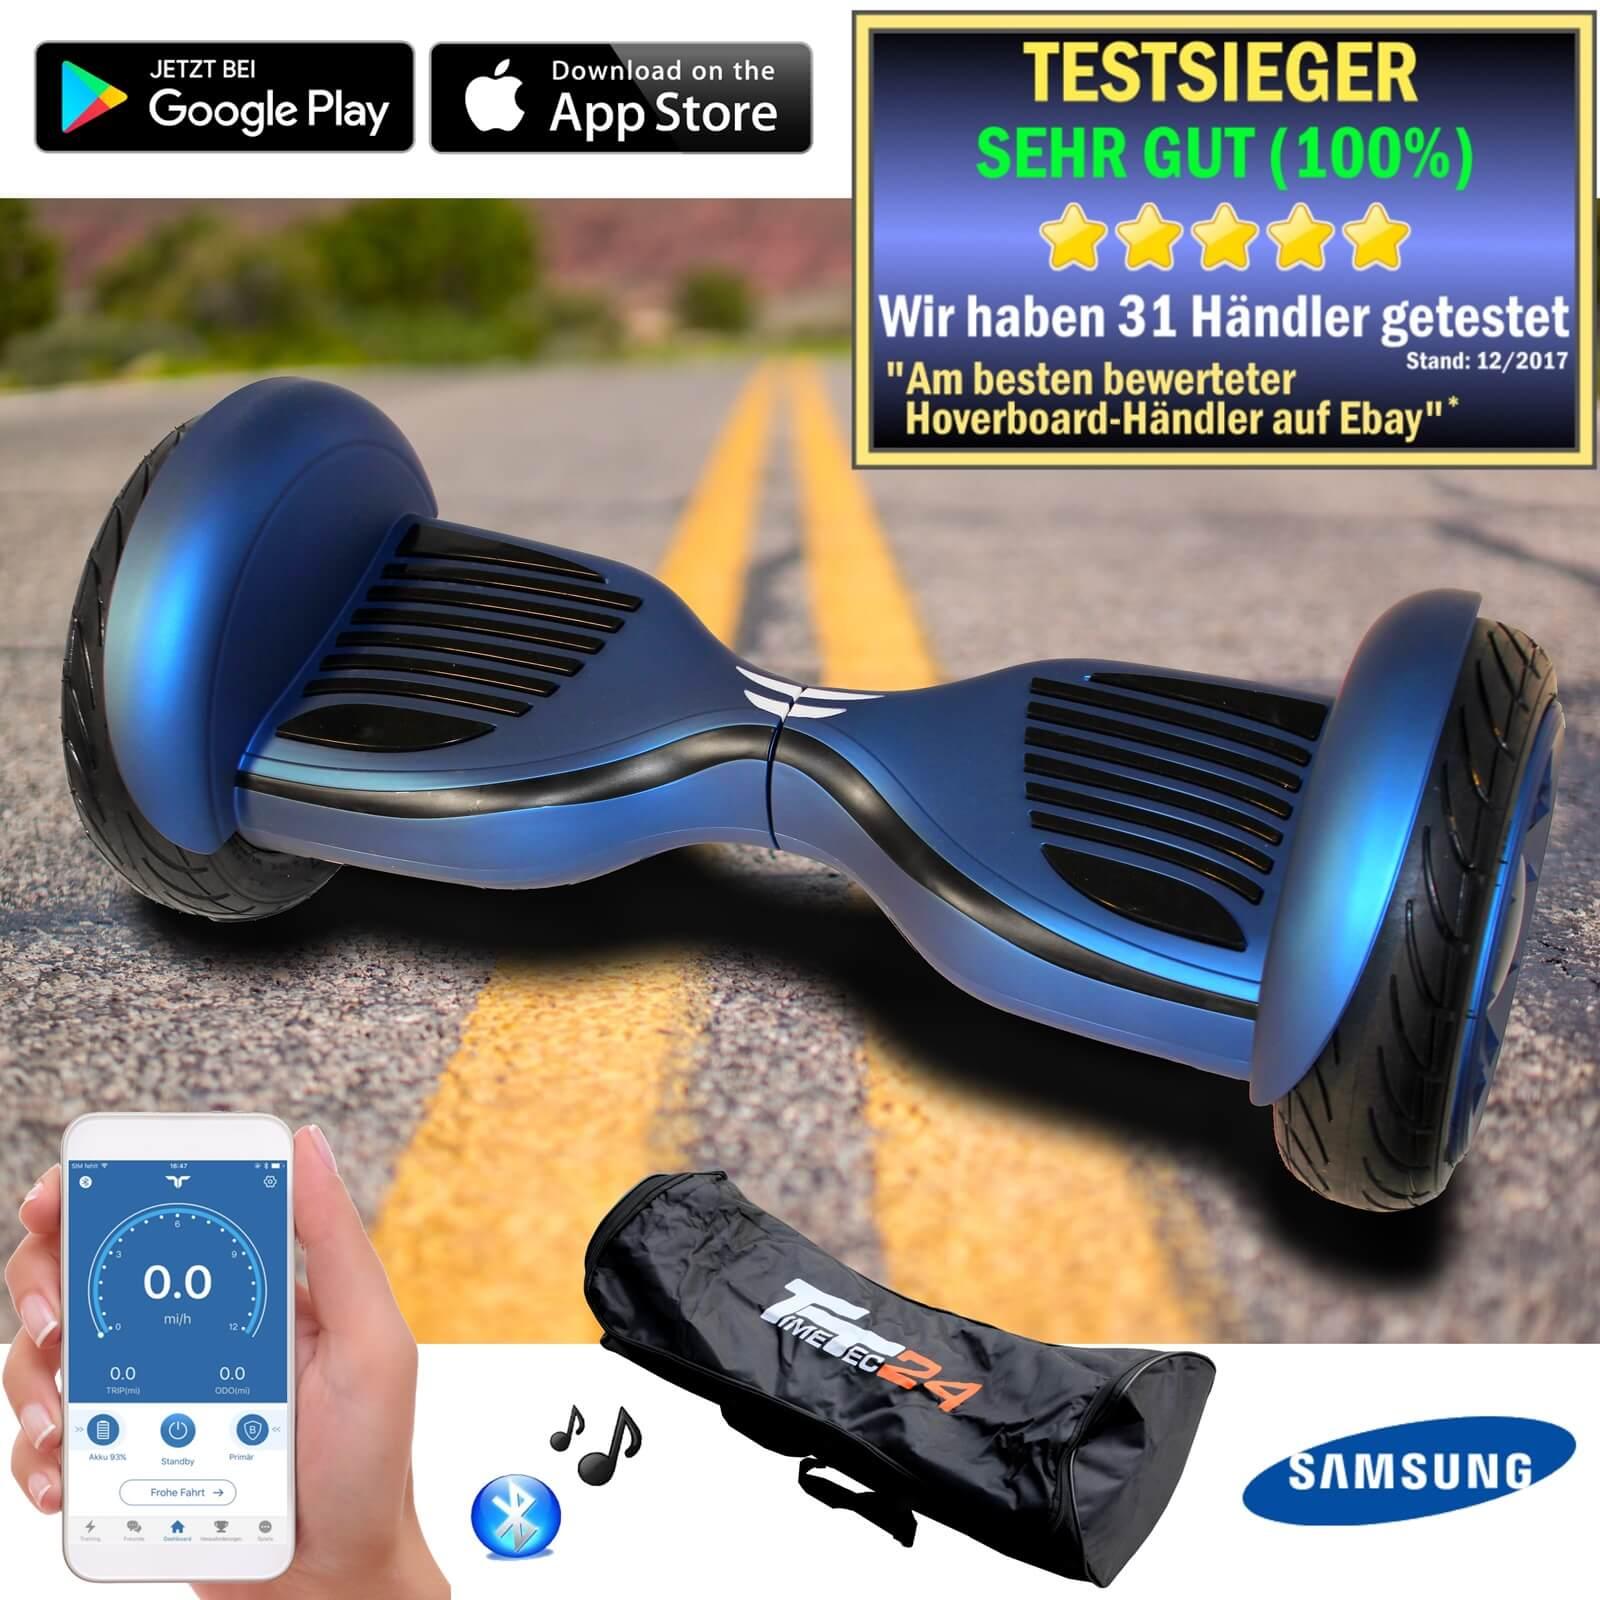 10 Zoll Hoverboard Self Self Hoverboard Balance Scooter Kinder Sicherheitsmode APP Samsung-Akku f7cf17